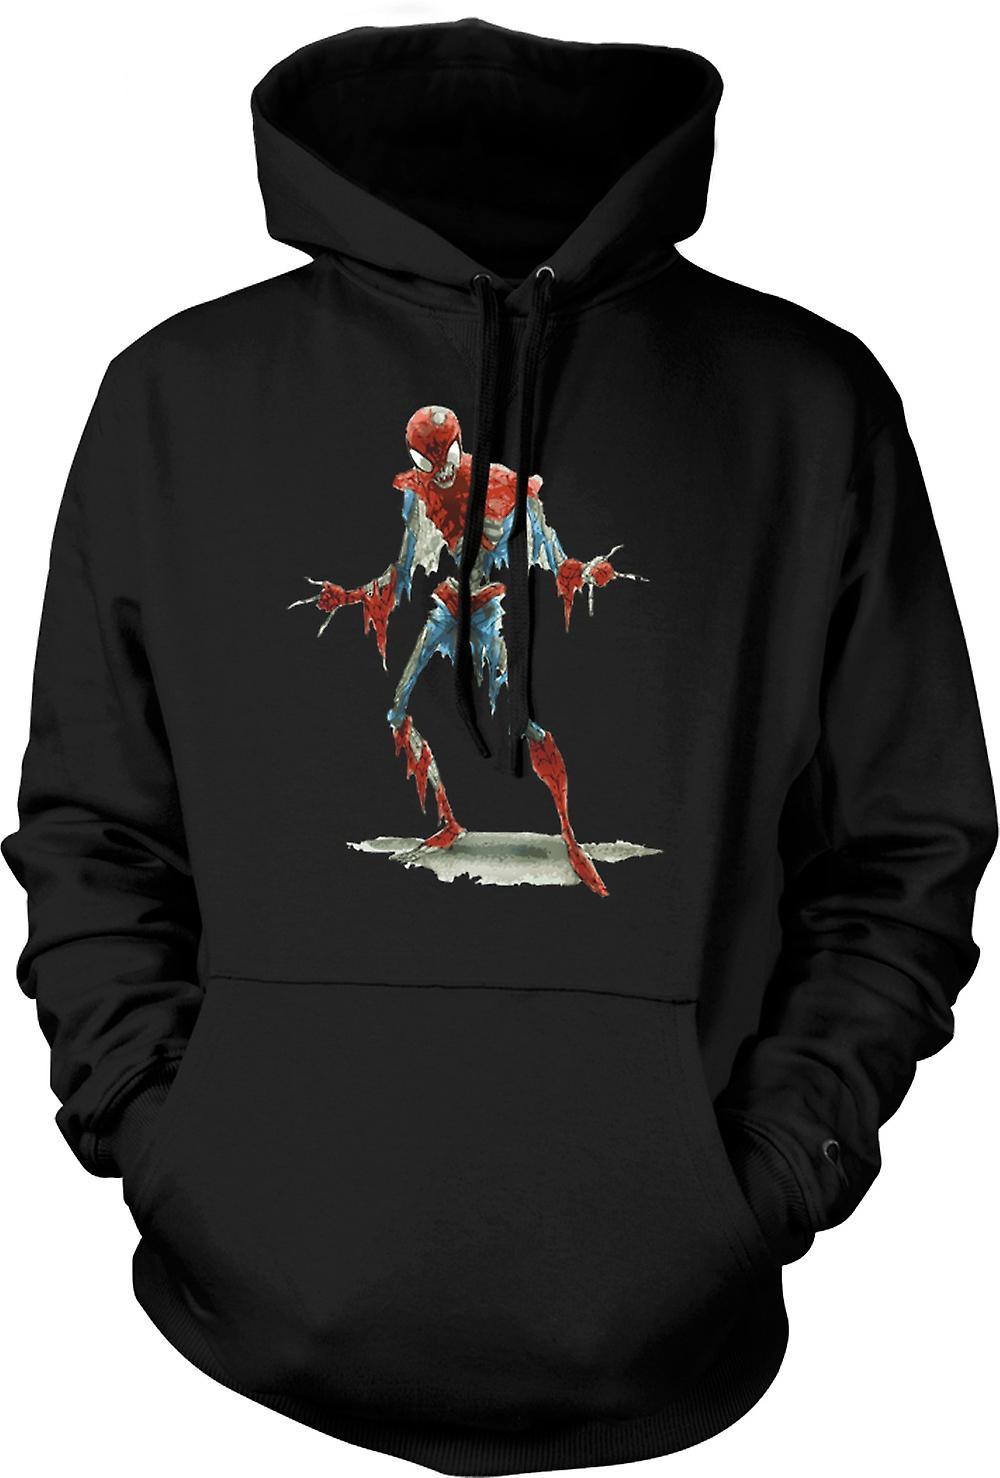 Para hombre con capucha - Spiderman Zombie - gracioso